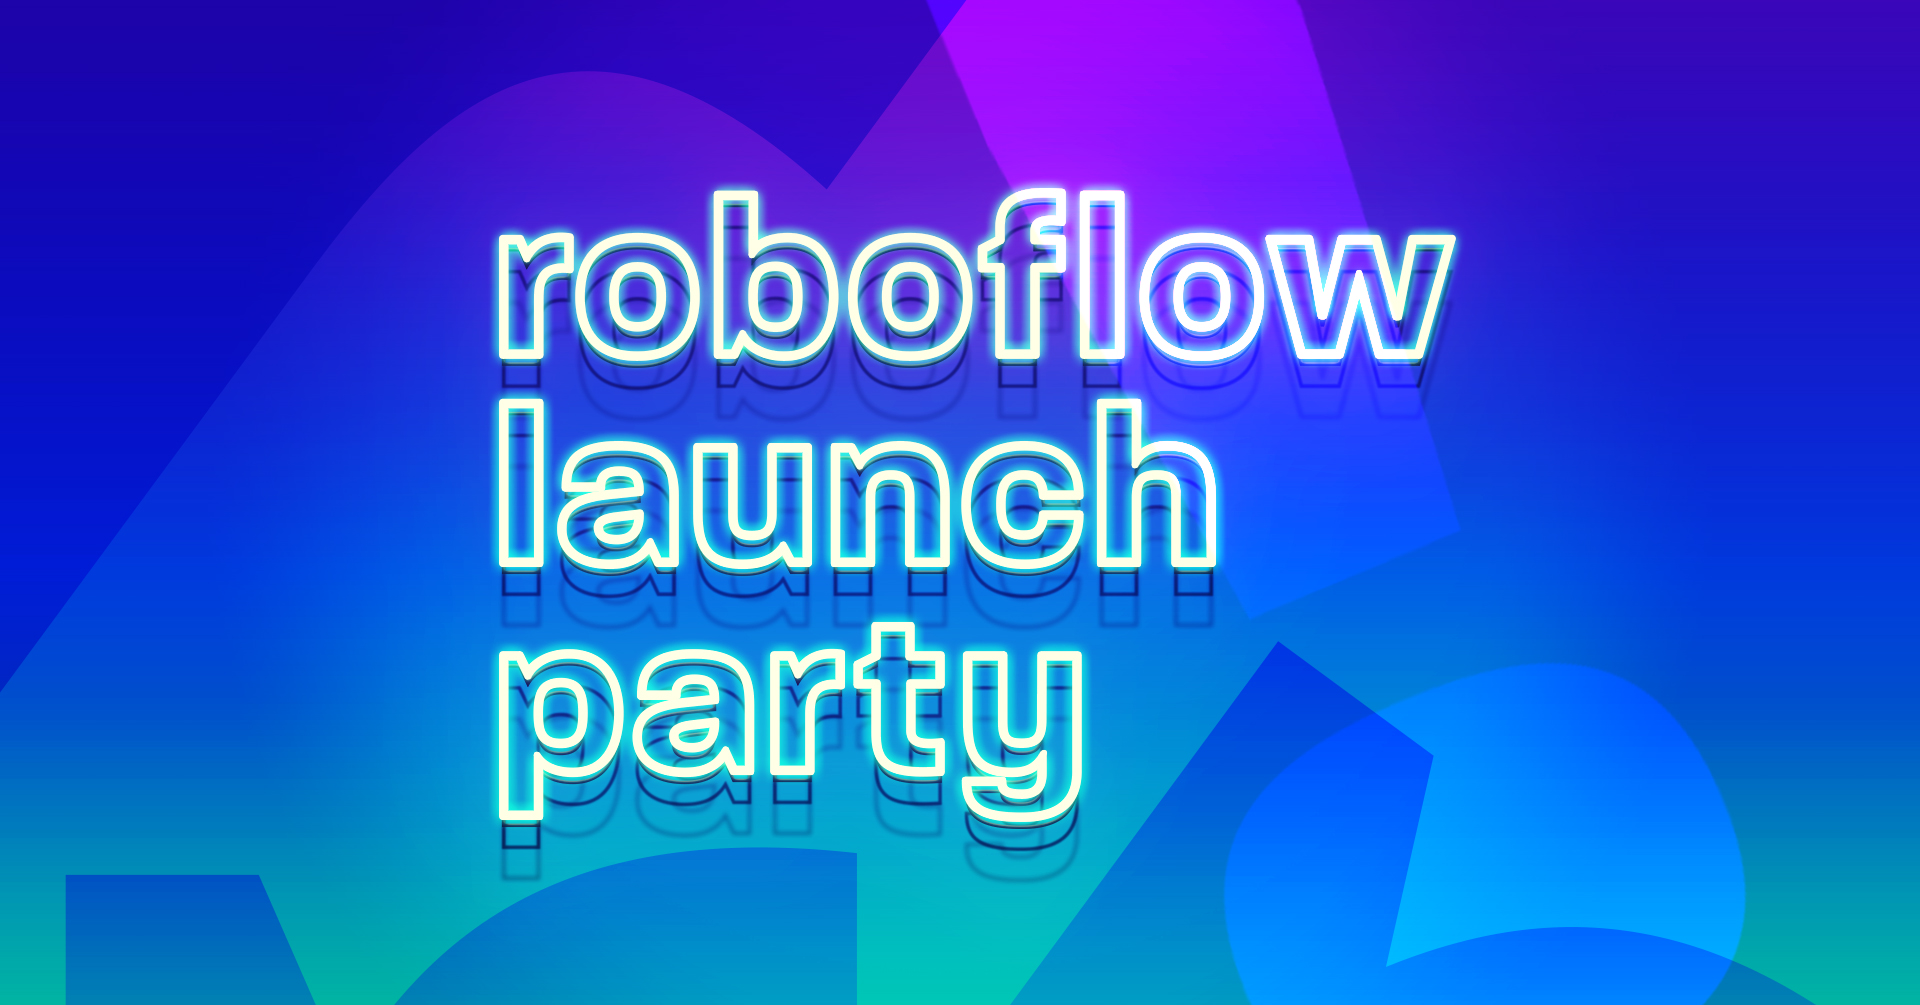 Roboflow Launch Party